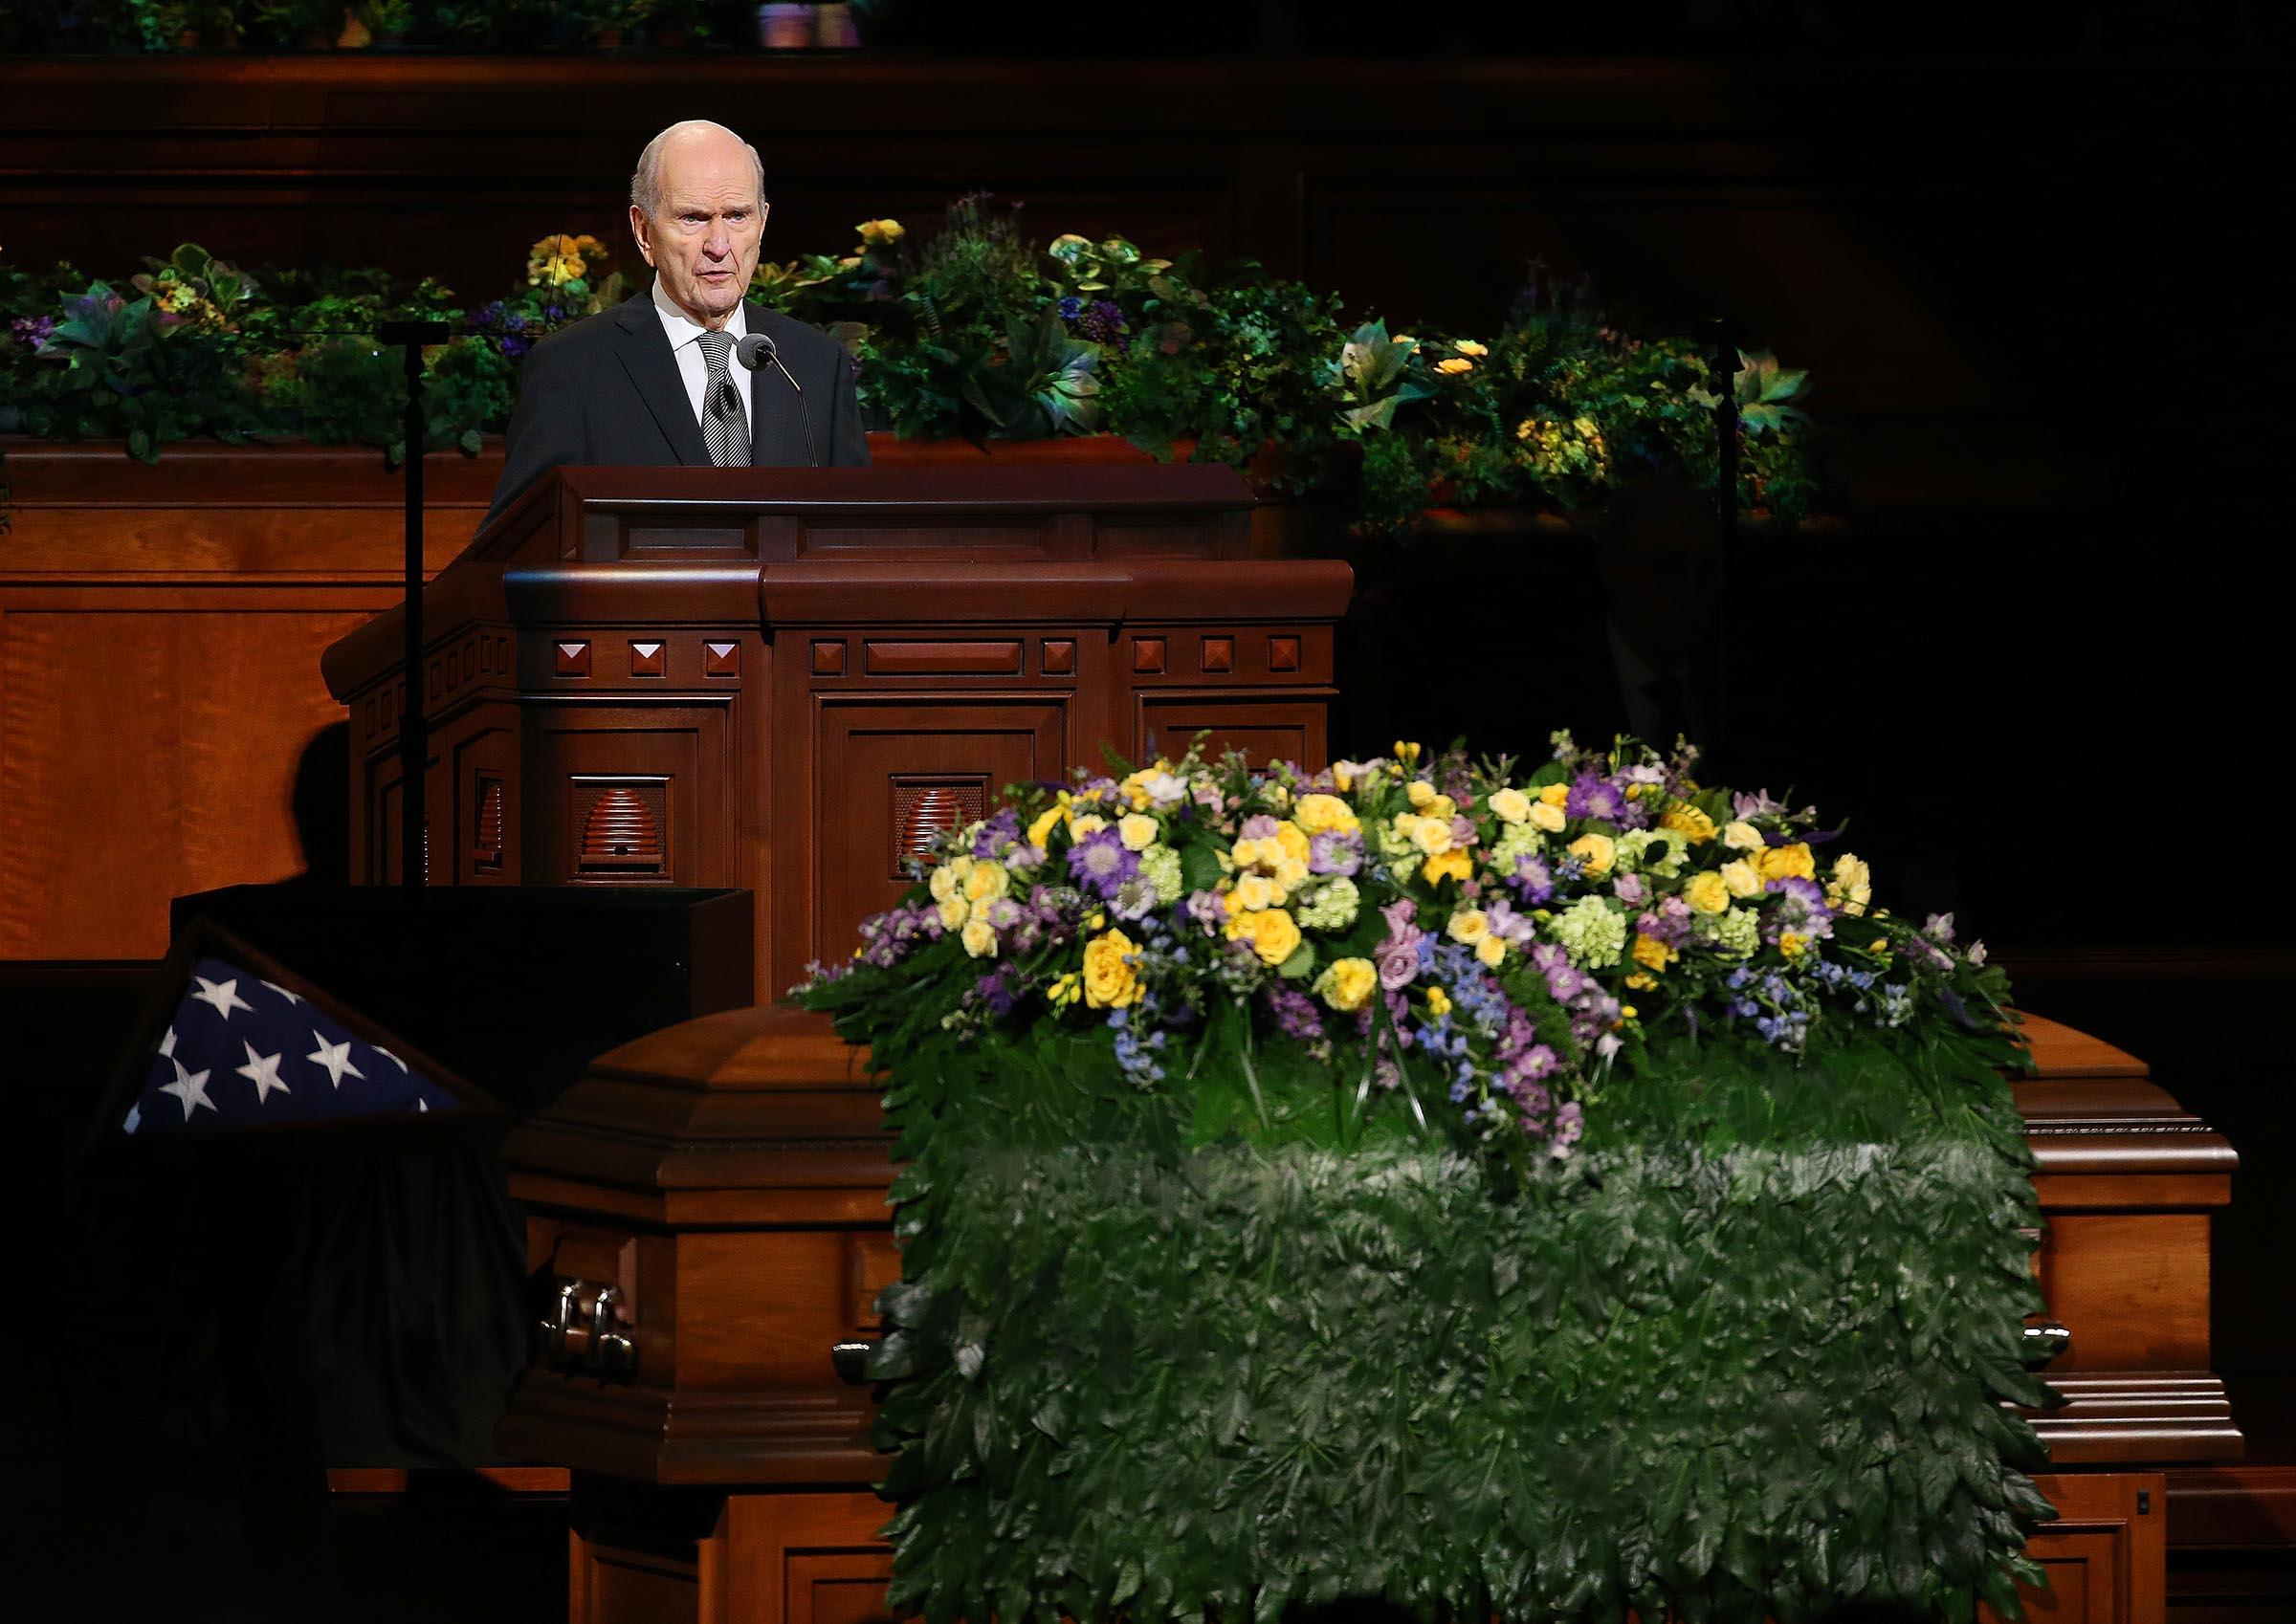 President Russell M. Nelson, president of the LDS Church's Quorum of the Twelve Apostles, speaks at President Thomas S. Monson's funeral at the Conference Center in Salt Lake City on Friday, Jan. 12, 2018.